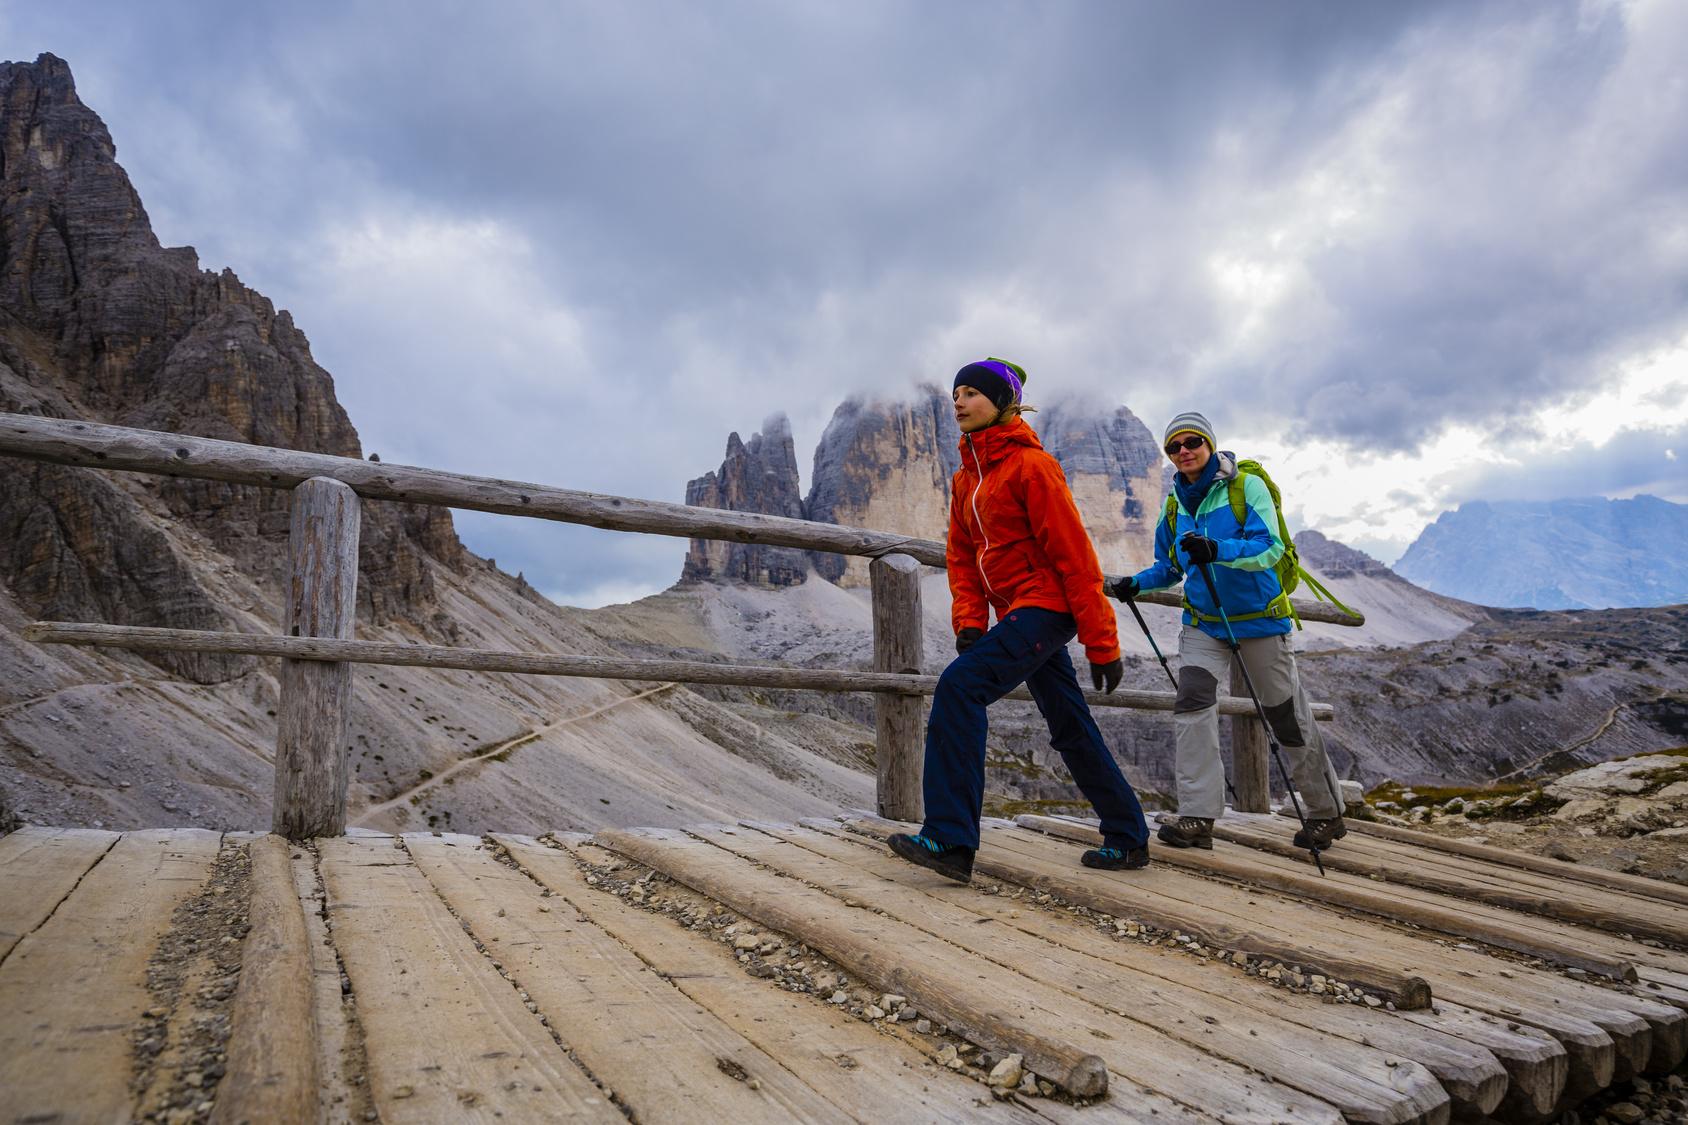 Hikers_Dolomites_bridge